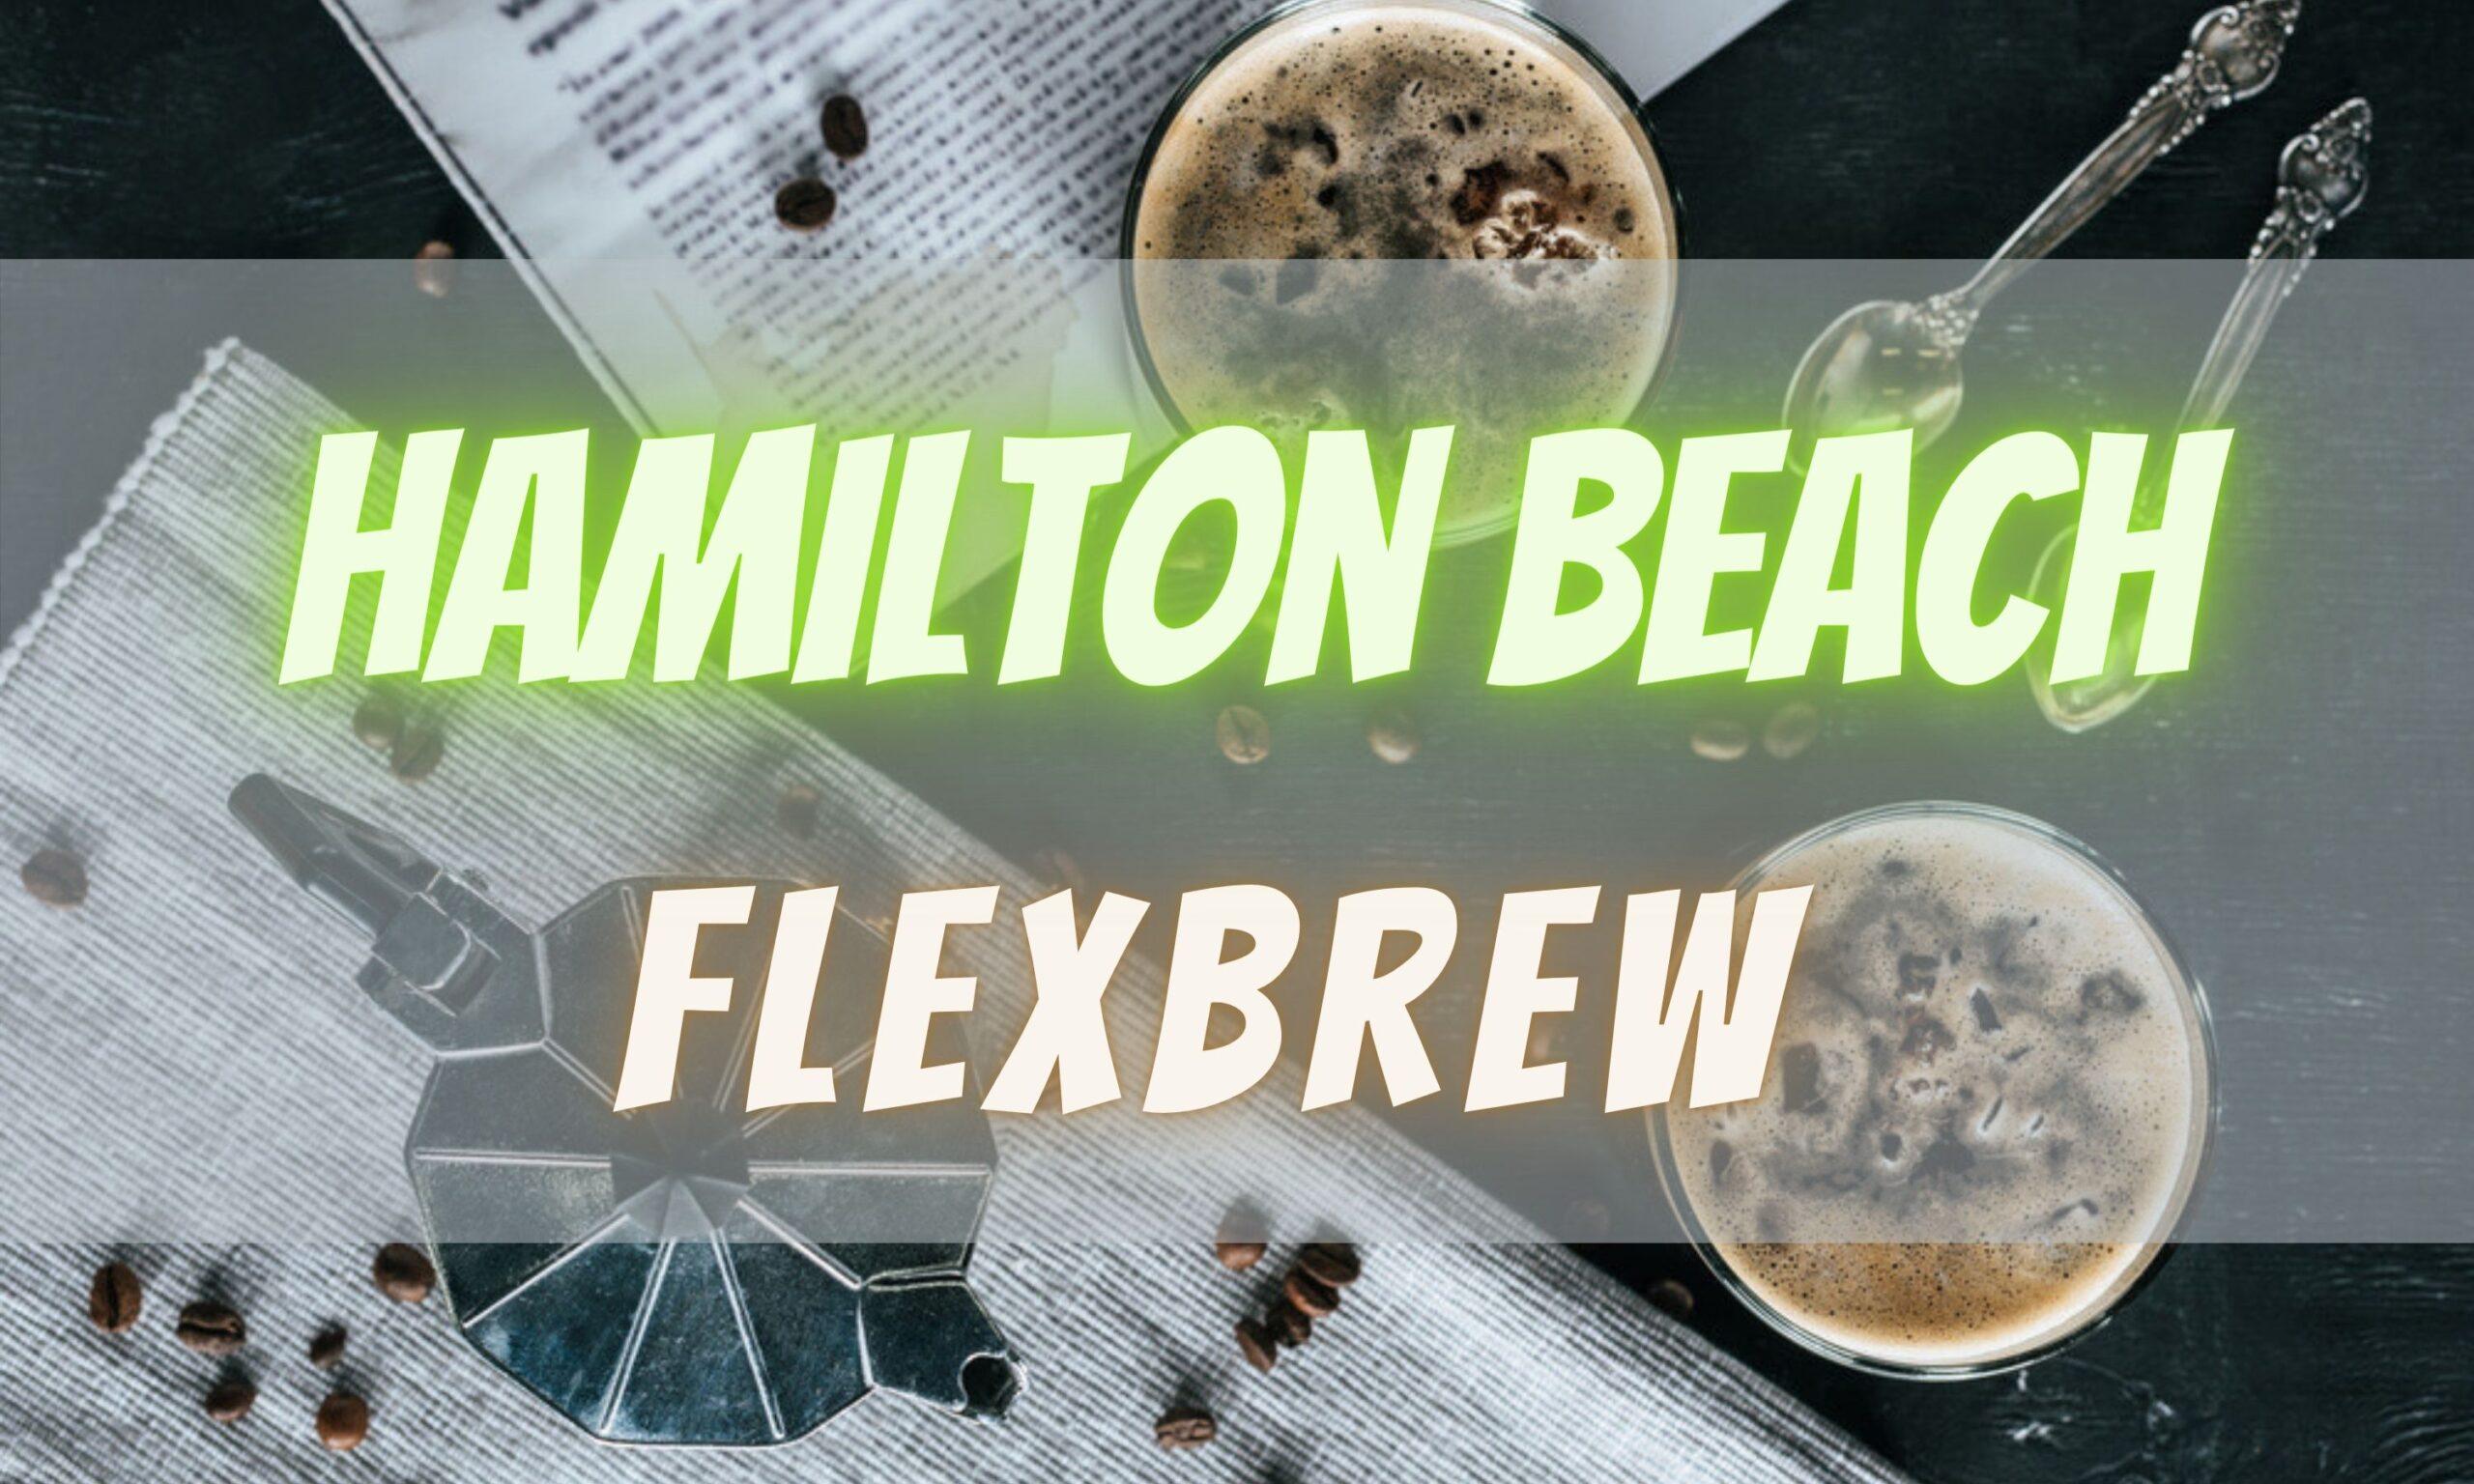 Hamilton Beach Flexbrew Feature Image